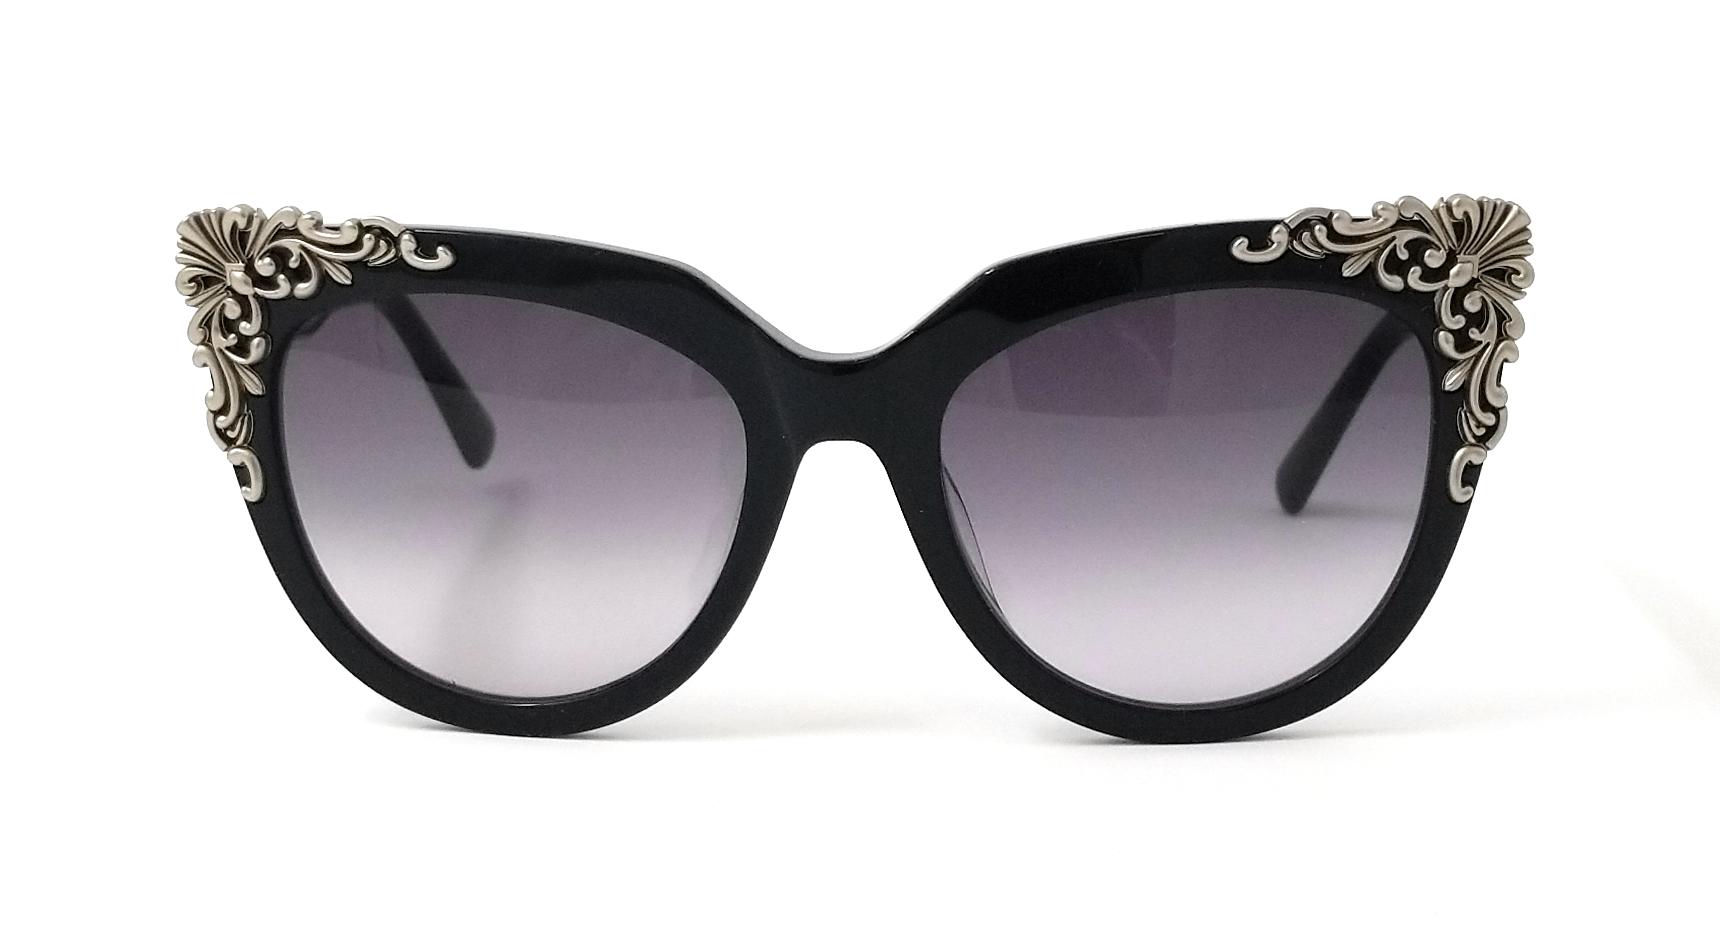 MCM Sunglasses MCM638S 001 Black Cat Eye Women 54x19x140